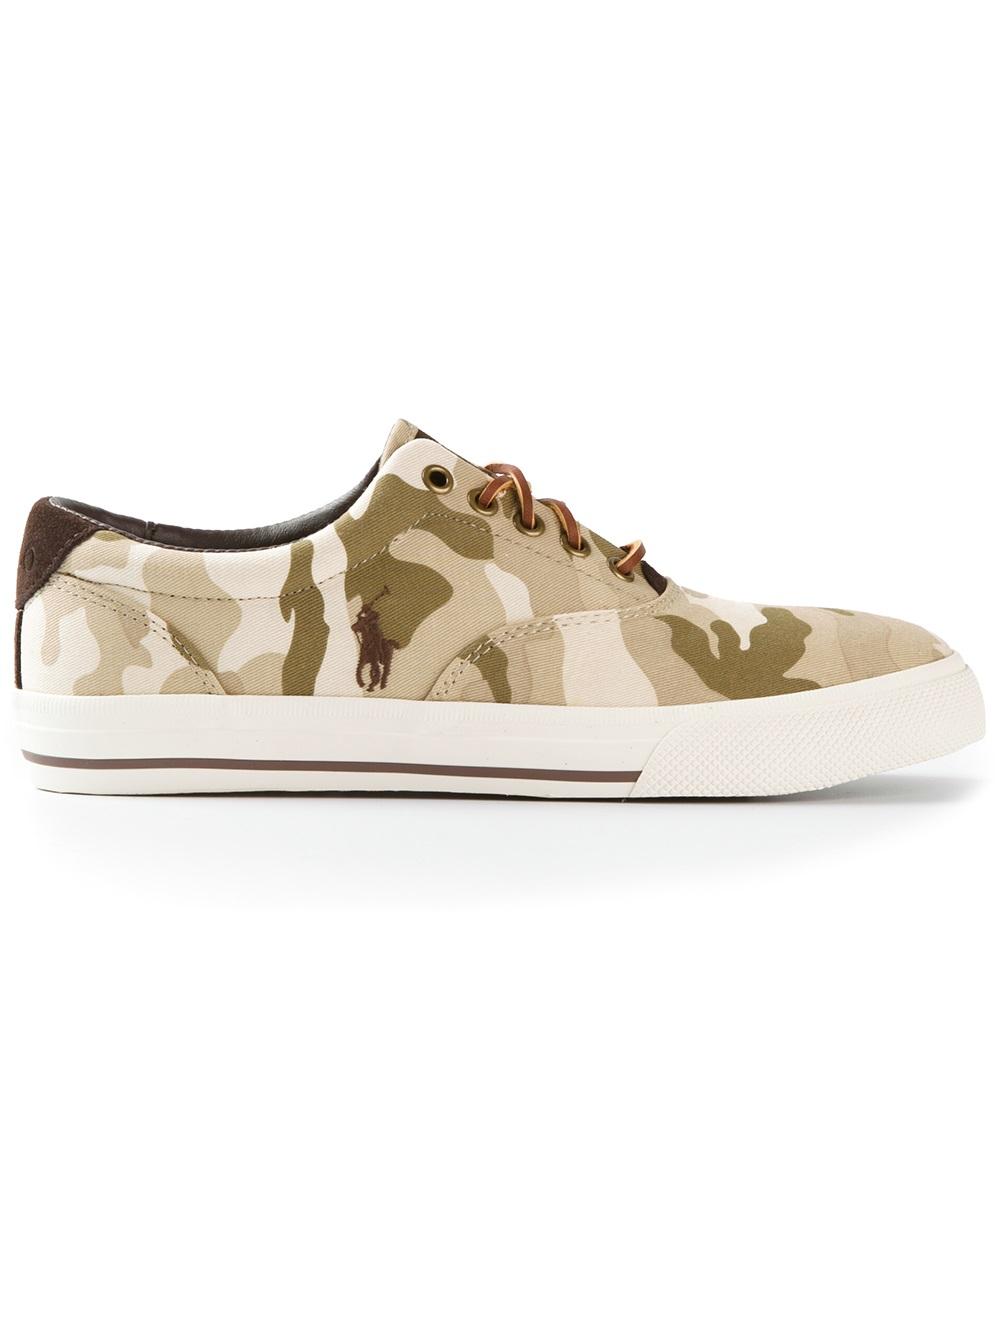 c880f1d710684 Polo Ralph Lauren 'Vaughn' Camouflage Sneaker in Natural for Men - Lyst